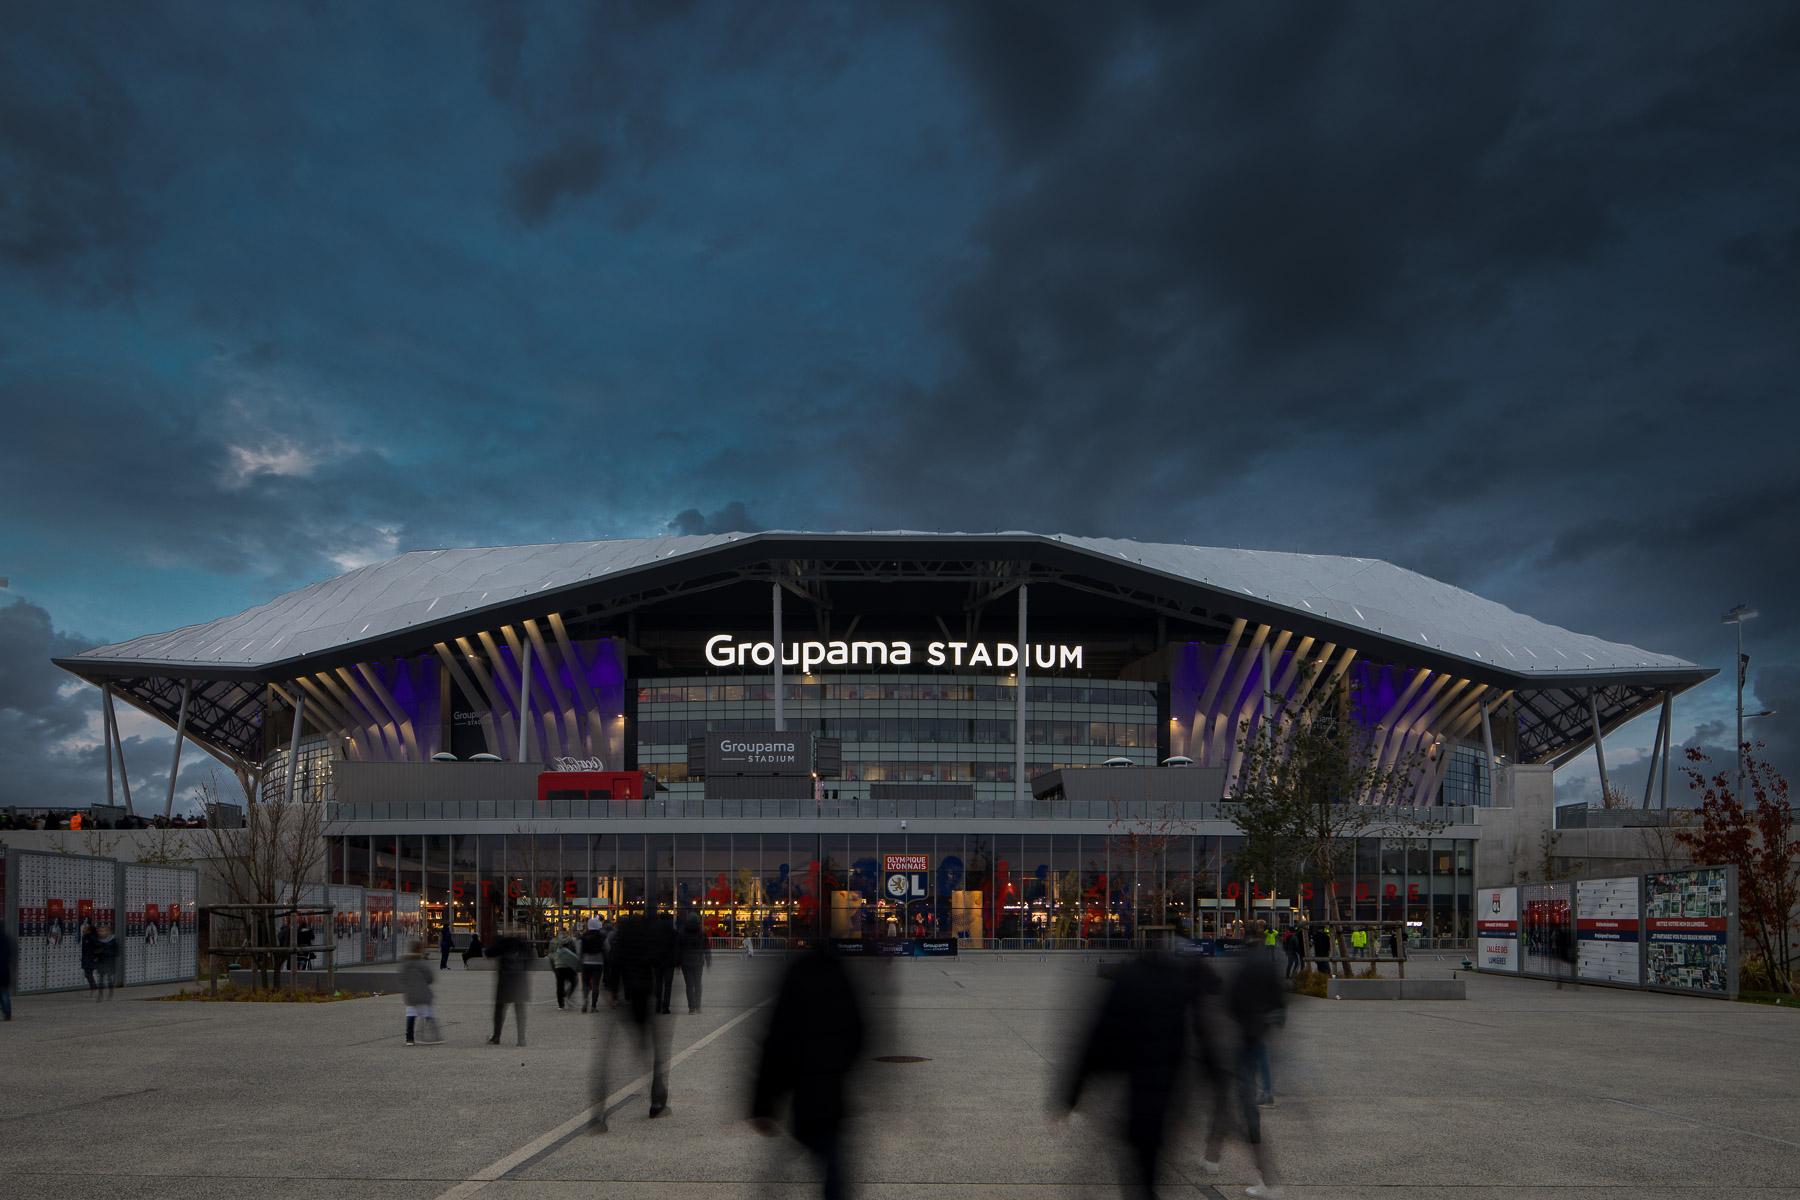 Groupama Stadium - Populous